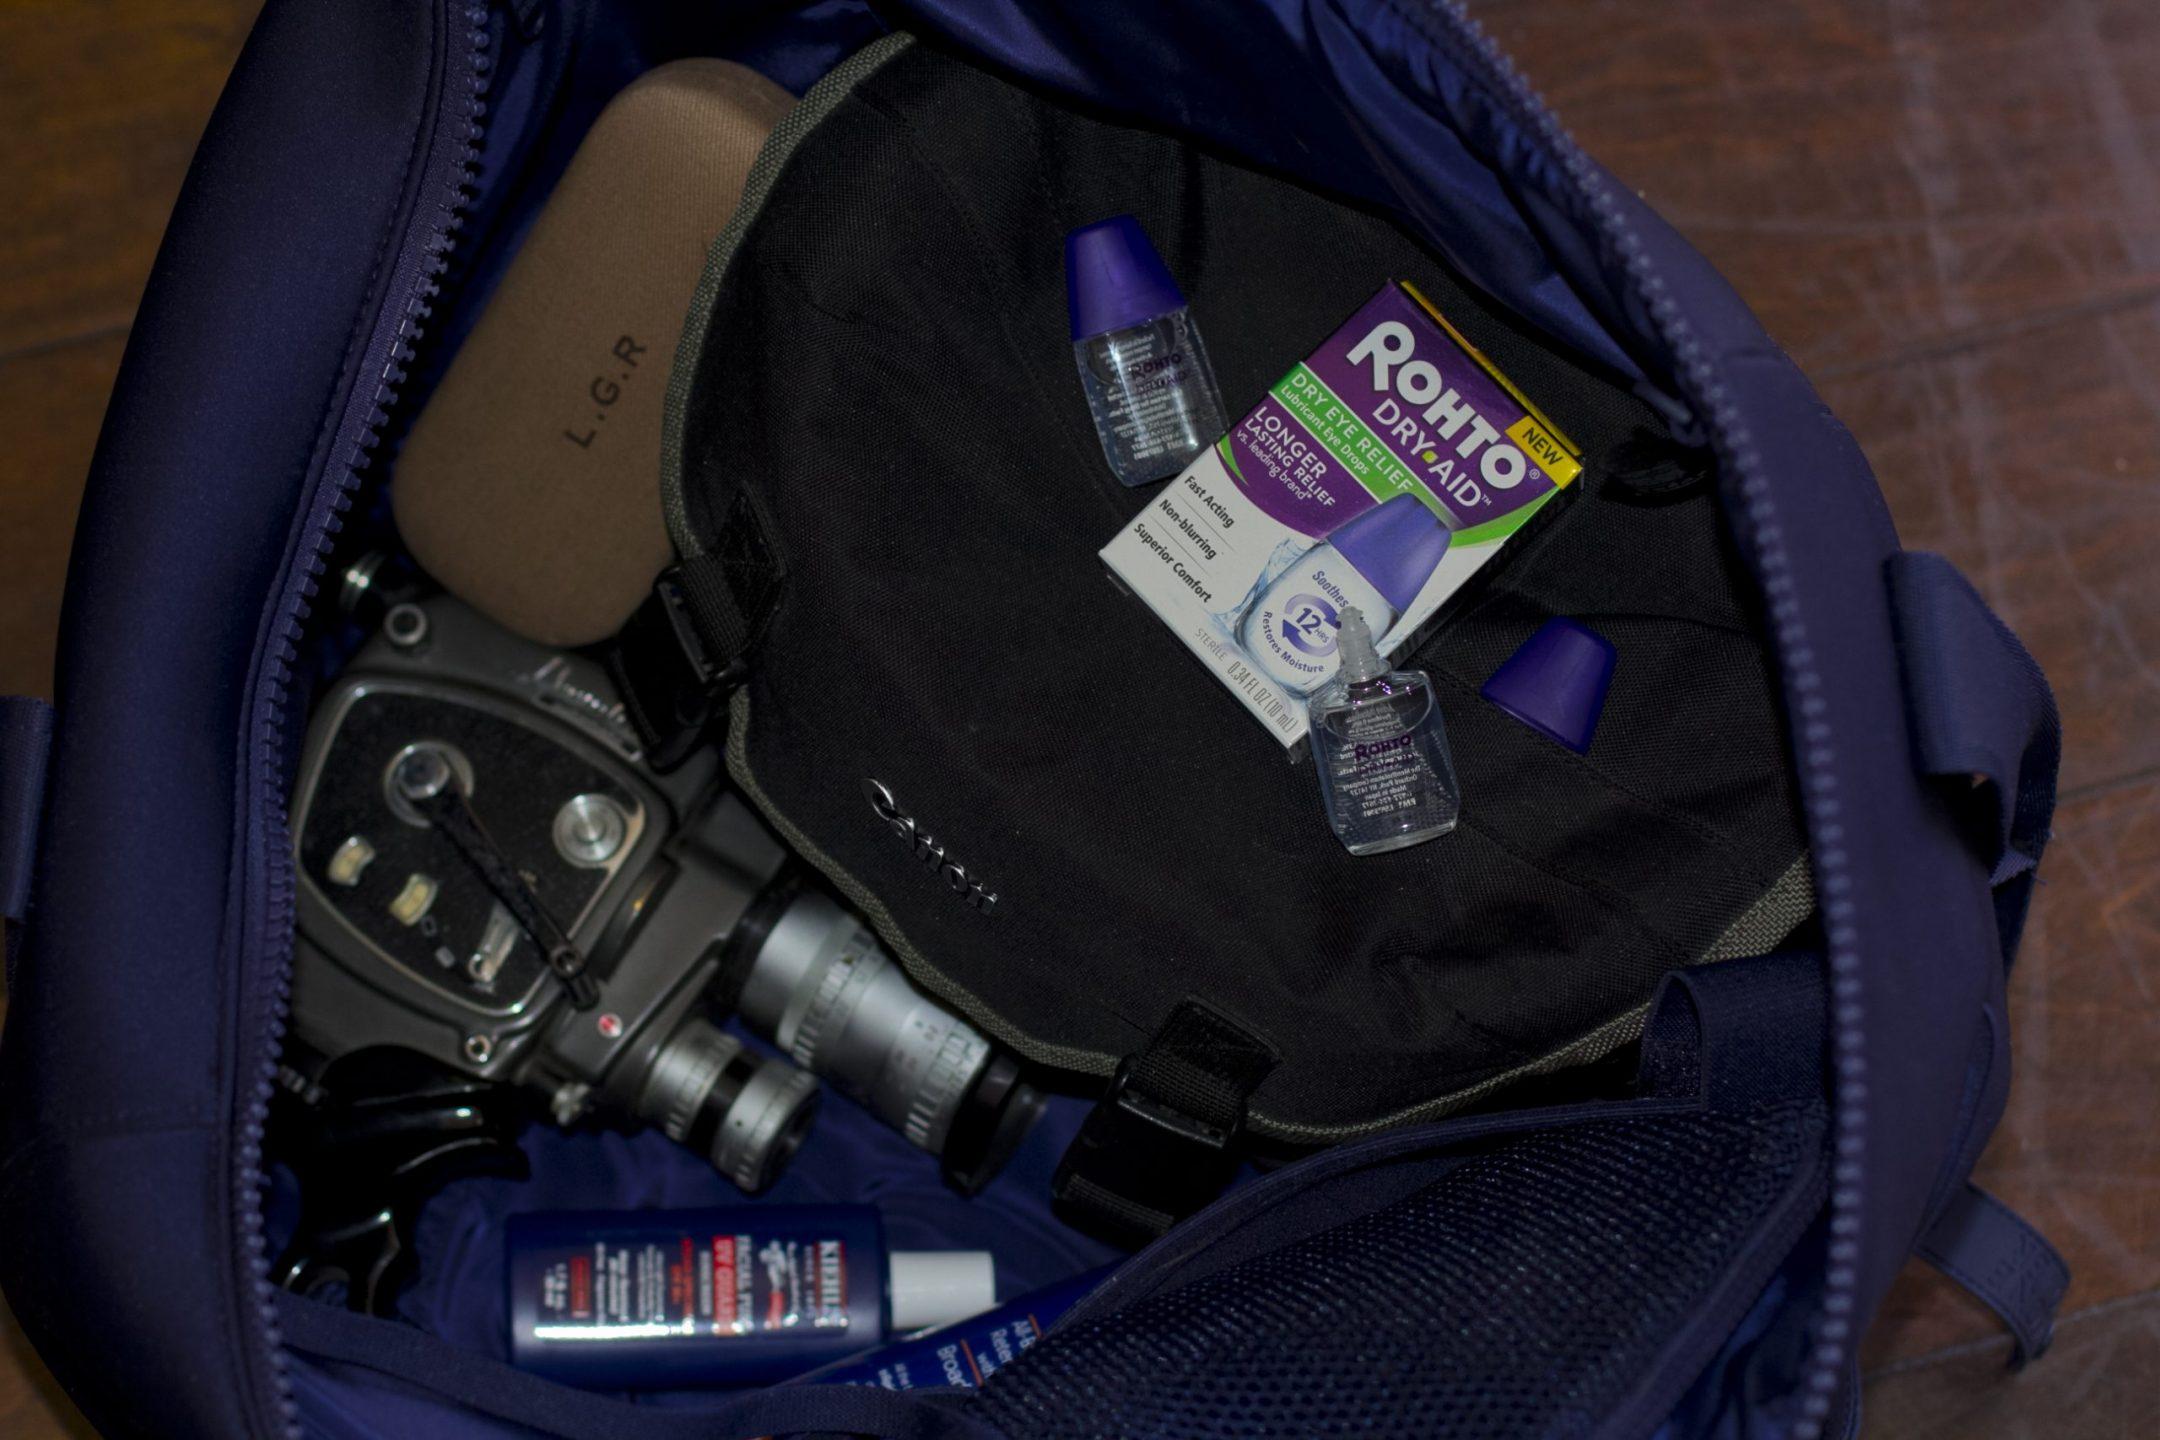 My Road Trip Essentials